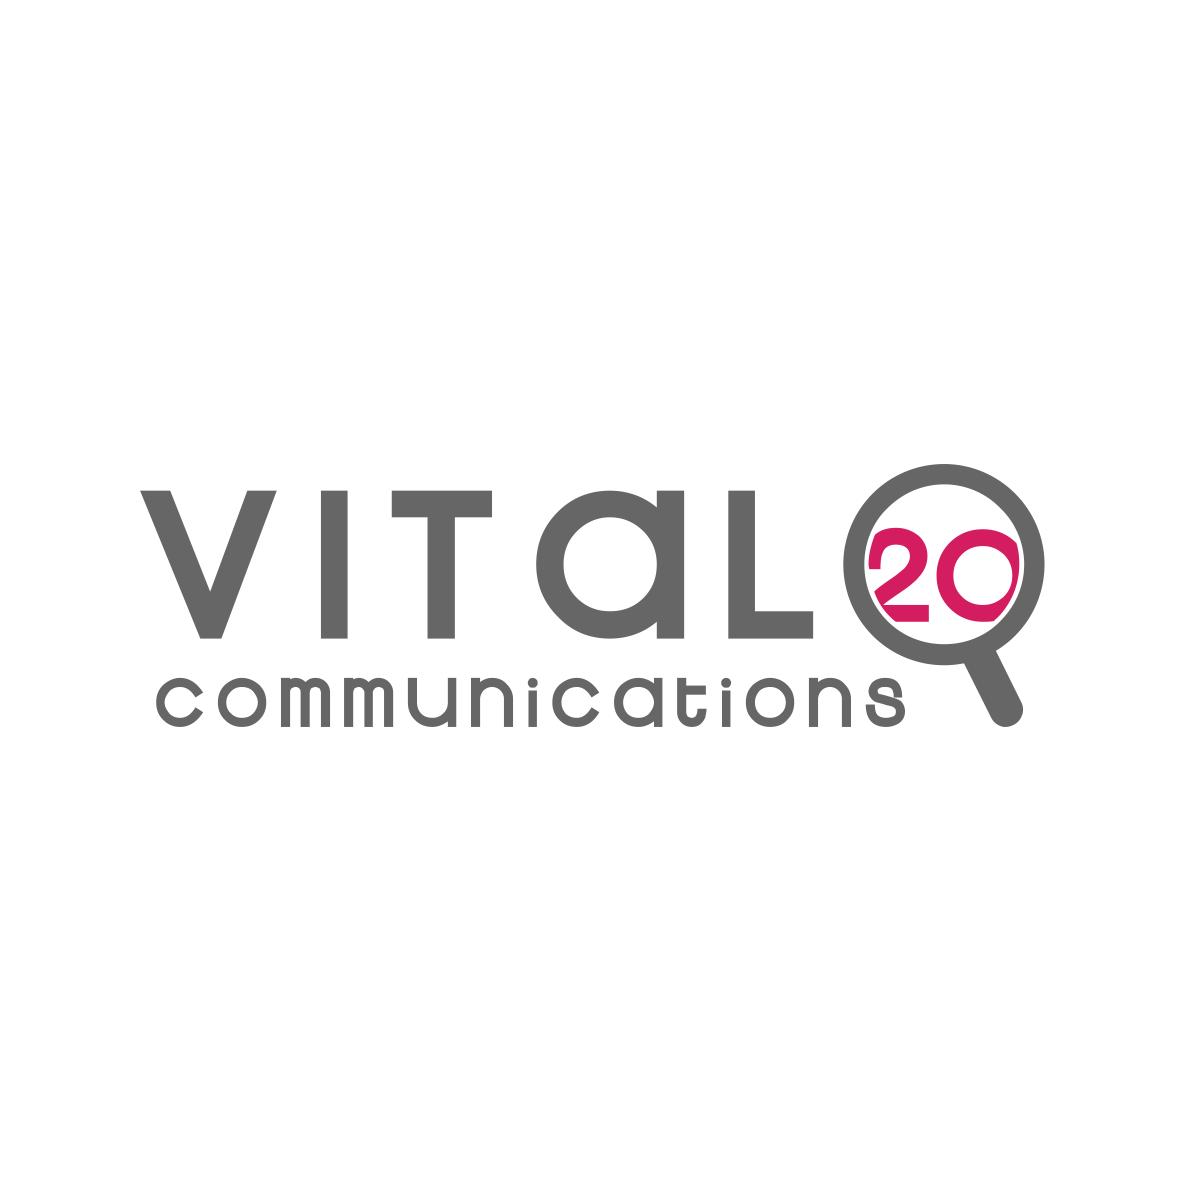 Vital20 Communications - Marketing & Advertising Agency in